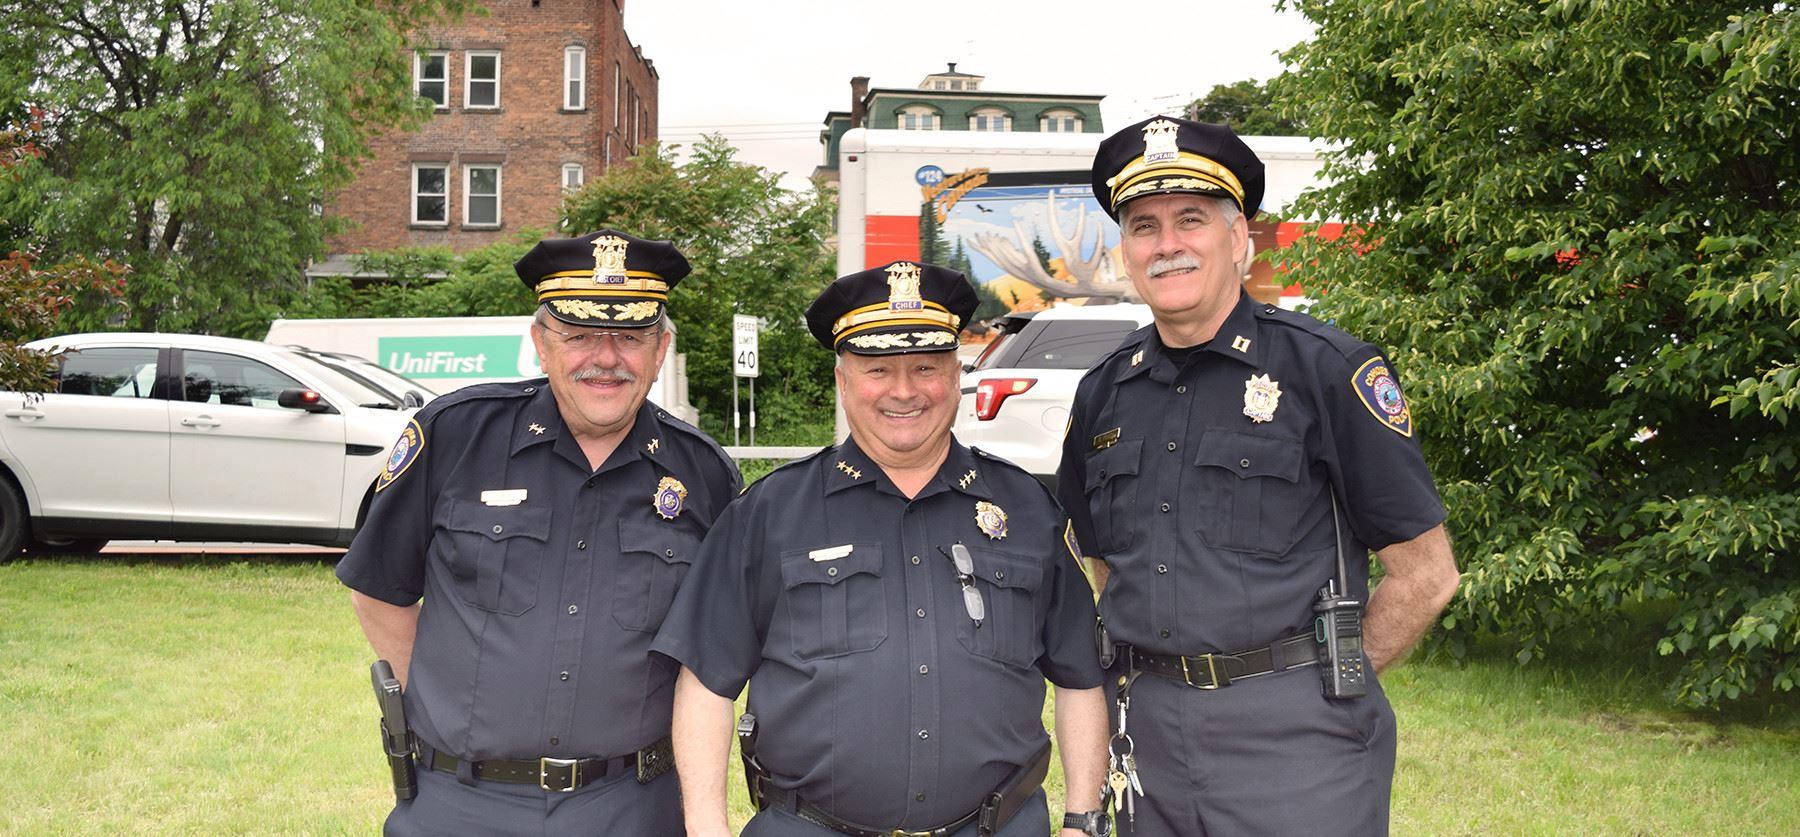 Police   Cohoes, NY